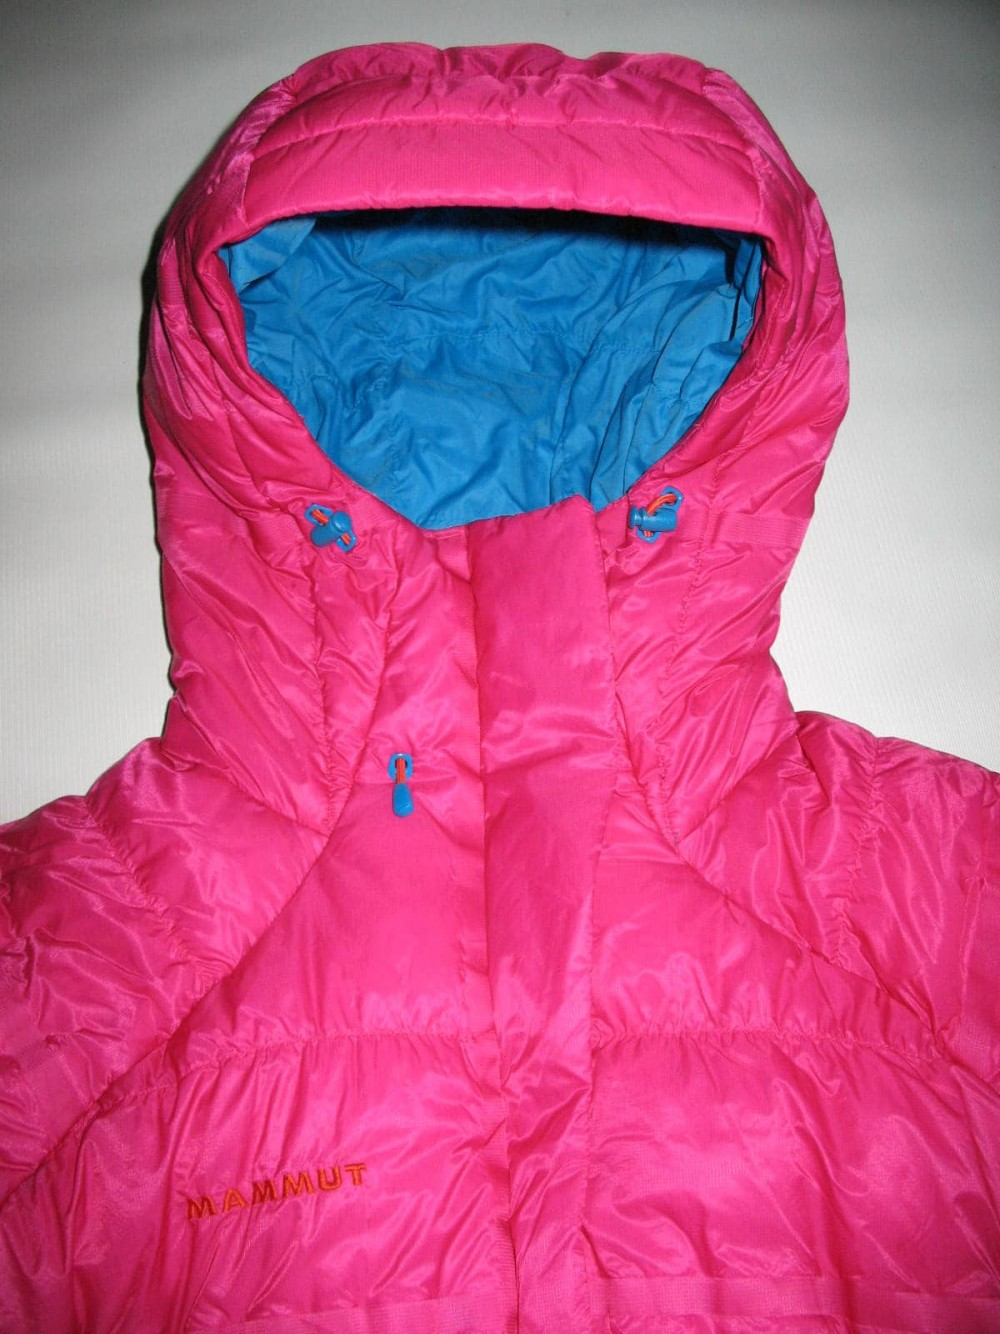 Куртка MAMMUT biwak eiger extreme jacket lady (размер S/M),3200 грн - 4